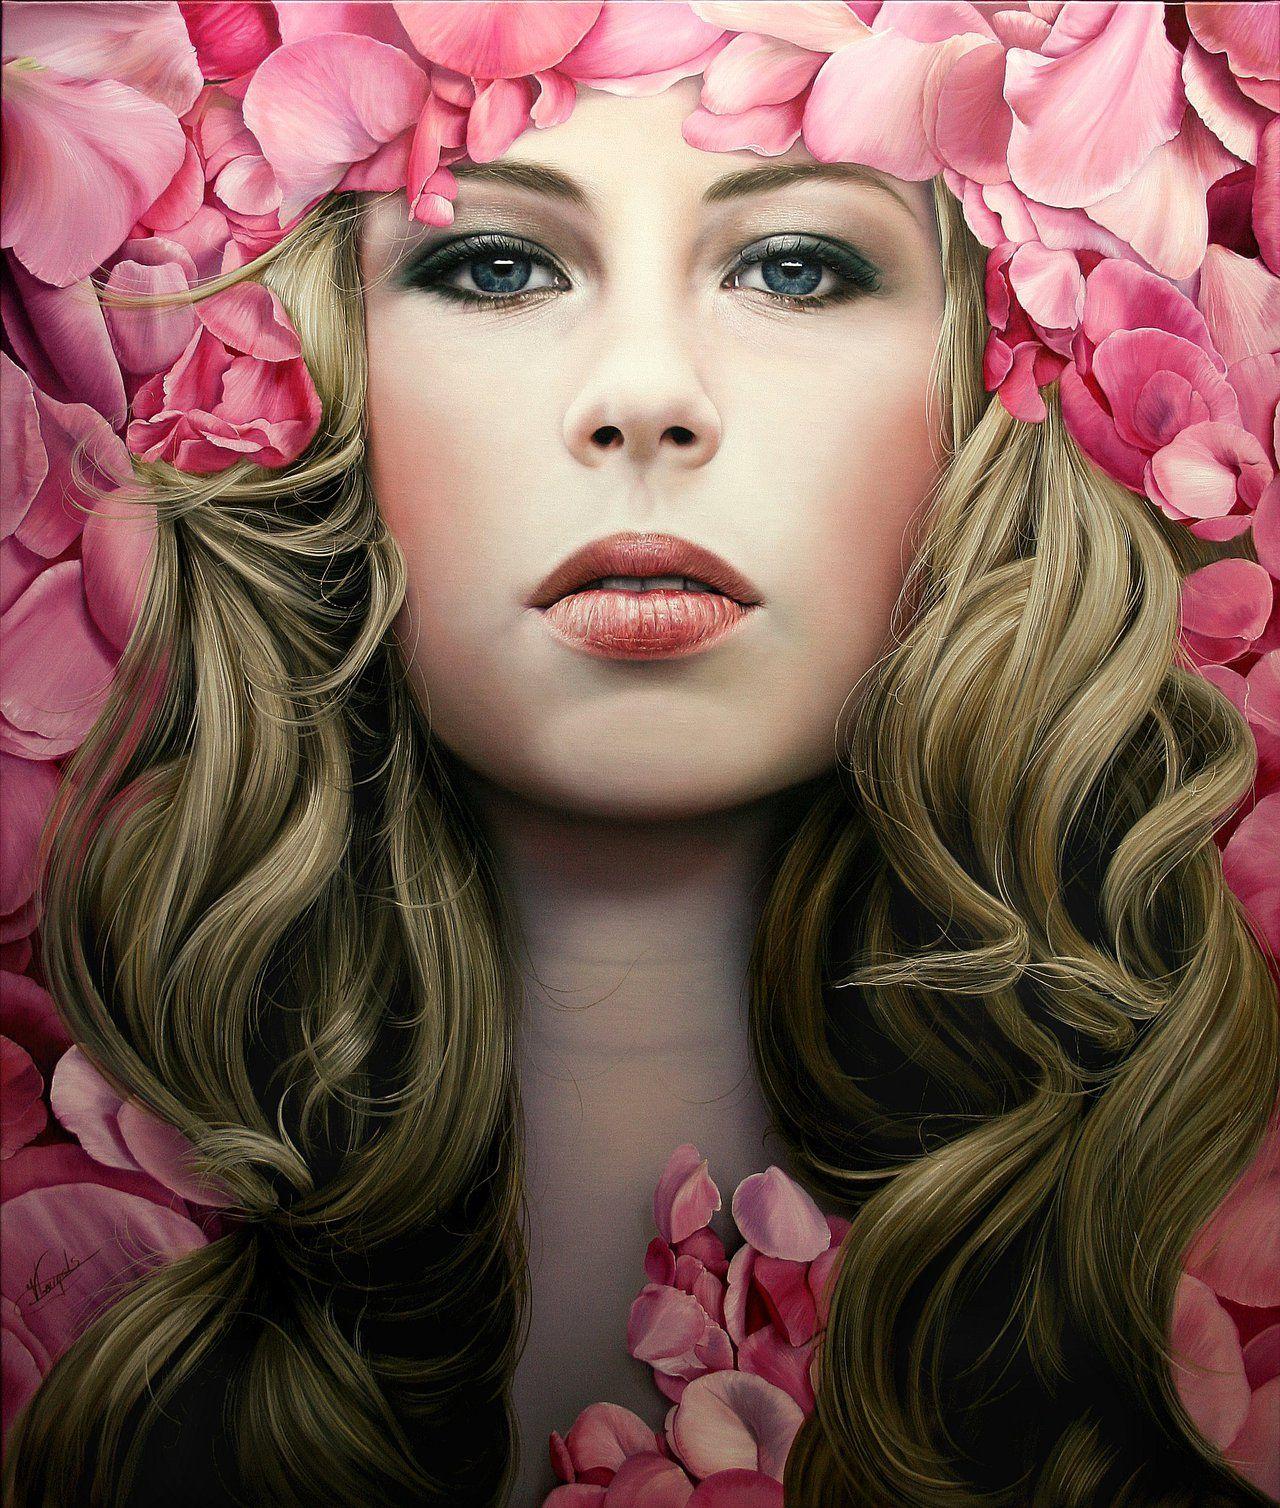 La vie en rose by Raipun.deviantart.com on @deviantART